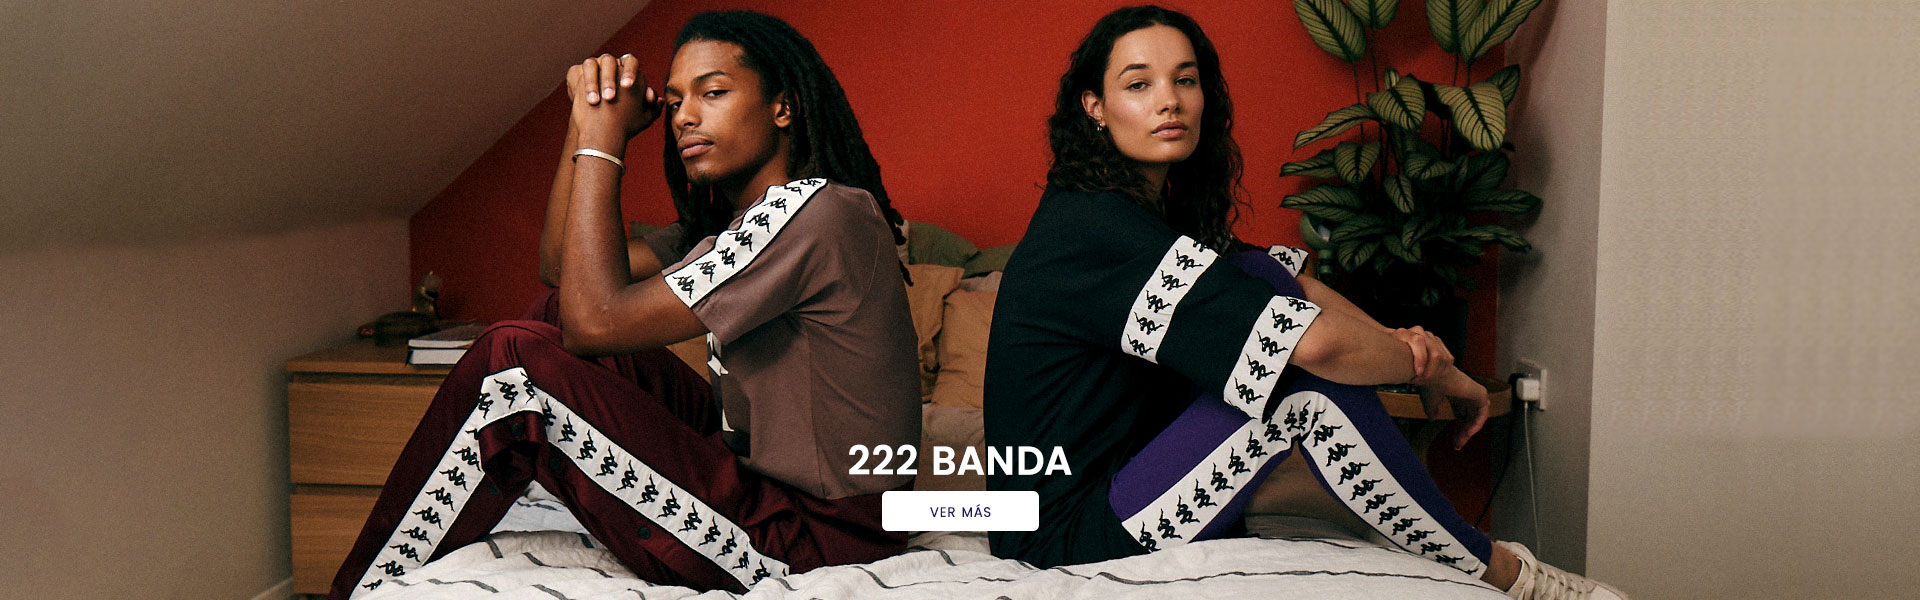 Kappa 222 Banda